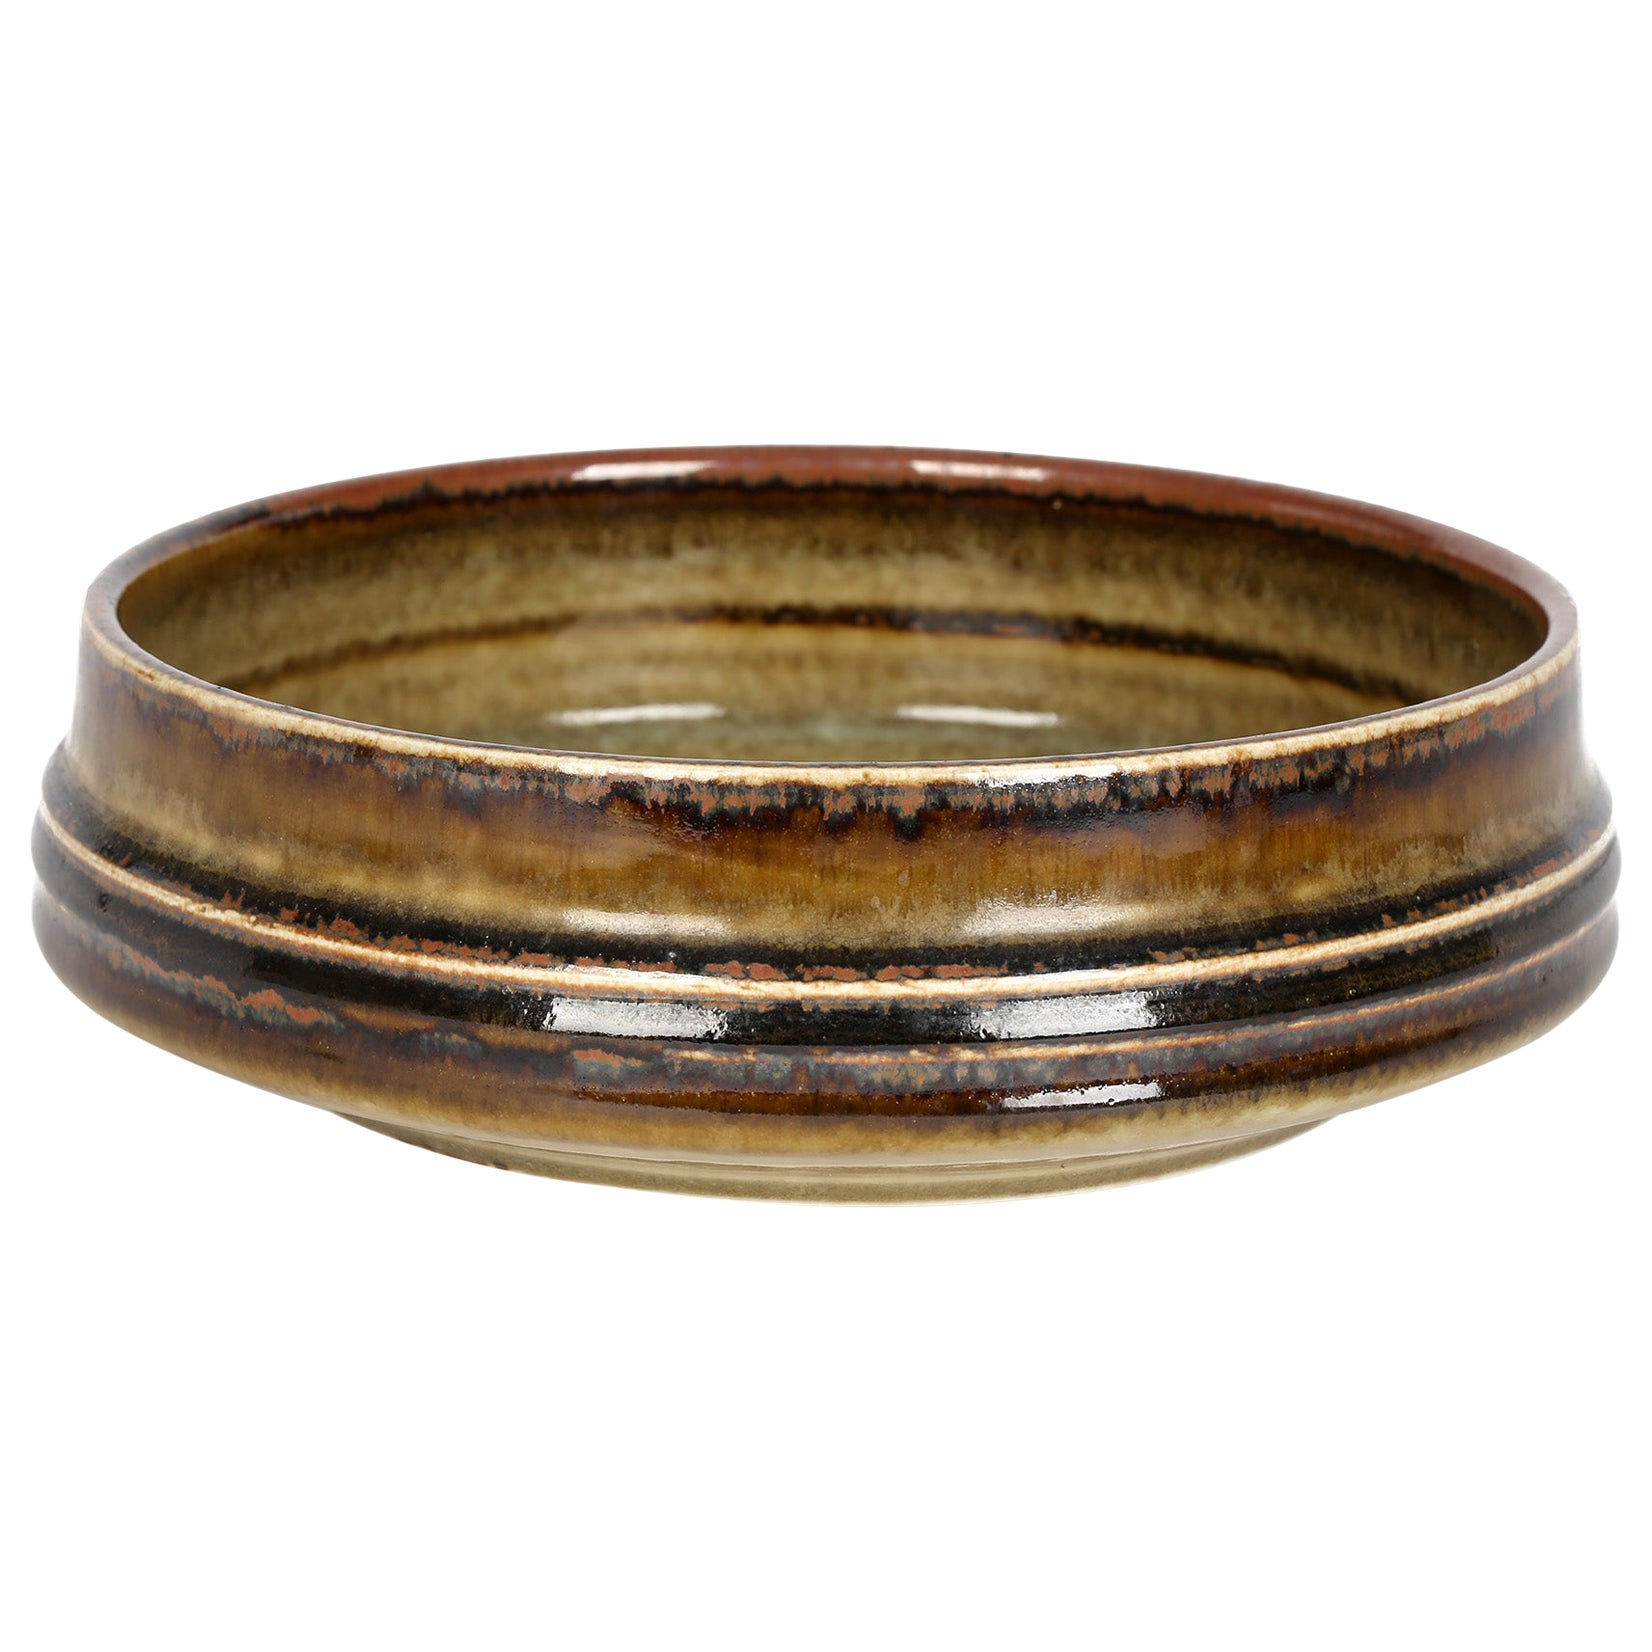 Olle Alberius for Rorstrand Mid-Century Studio Pottery Bowl